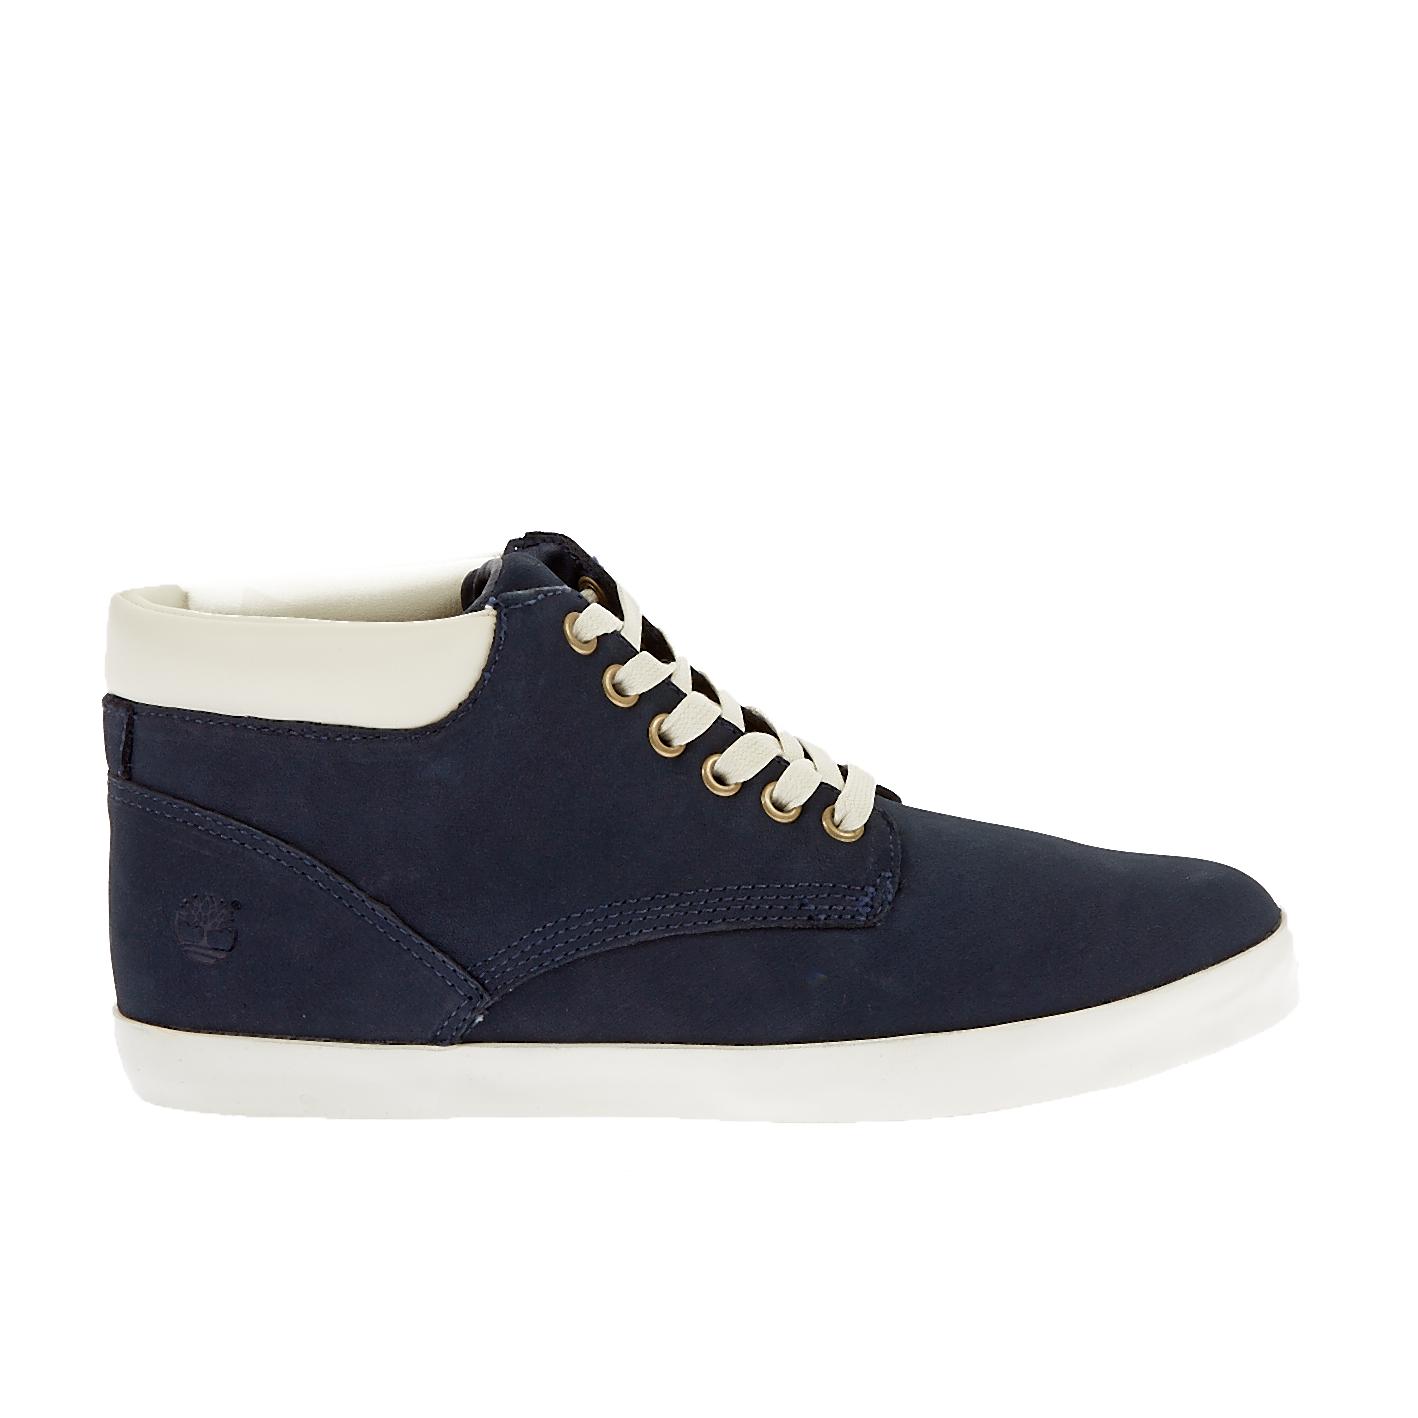 TIMBERLAND - Γυναικεία μποτάκια TIMBERLAND μπλε γυναικεία παπούτσια μπότες μποτάκια μποτάκια